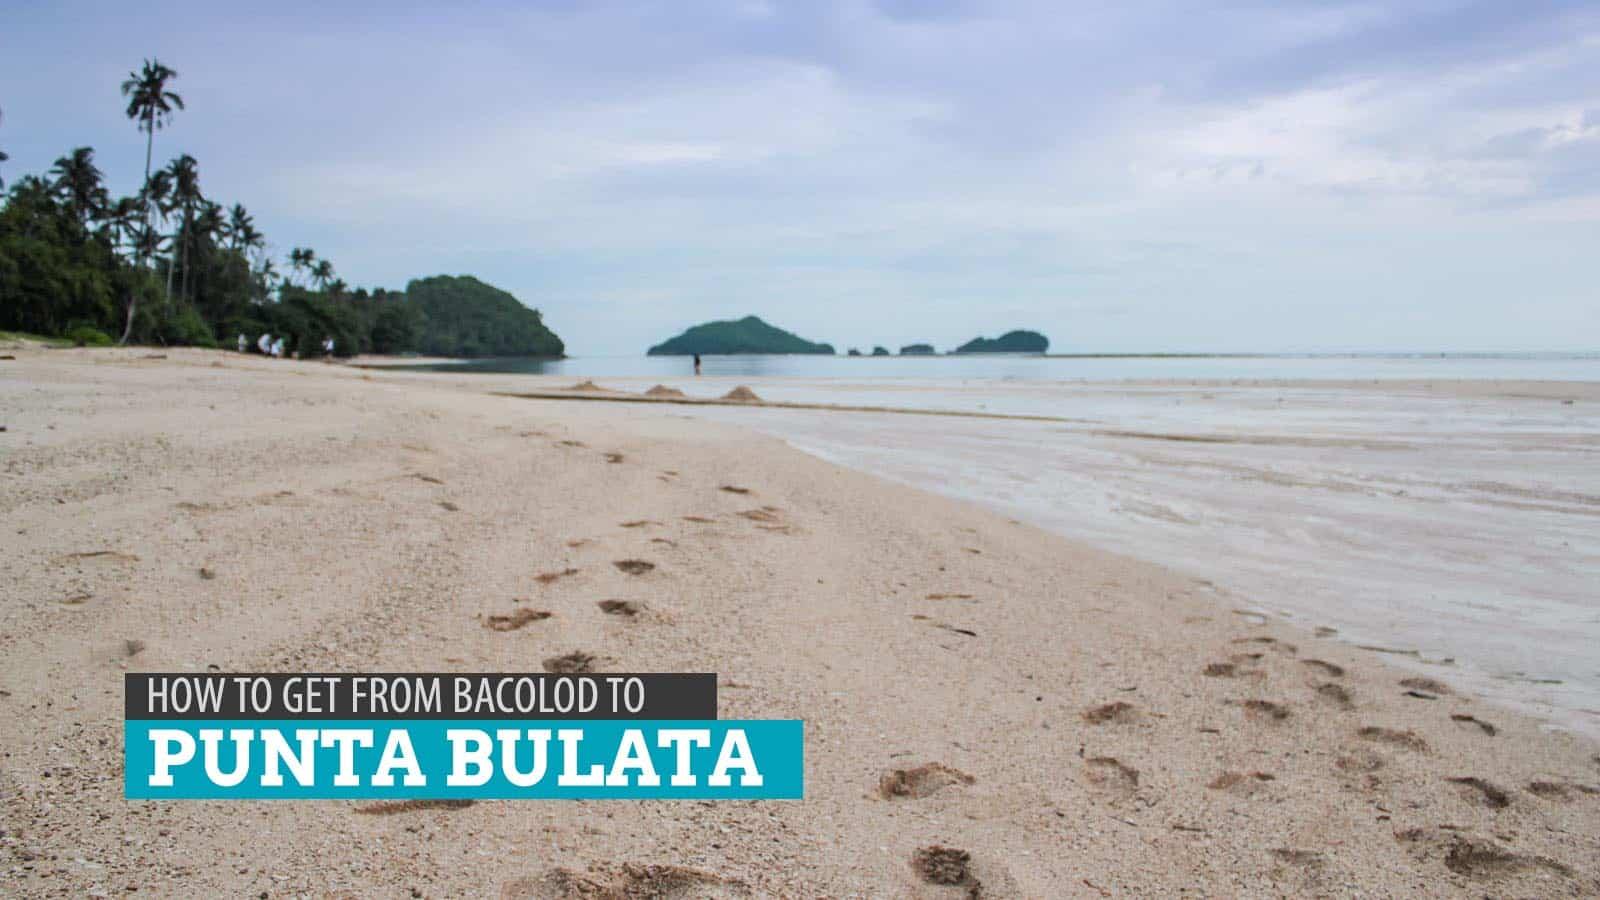 Punta Bulata Bacolod